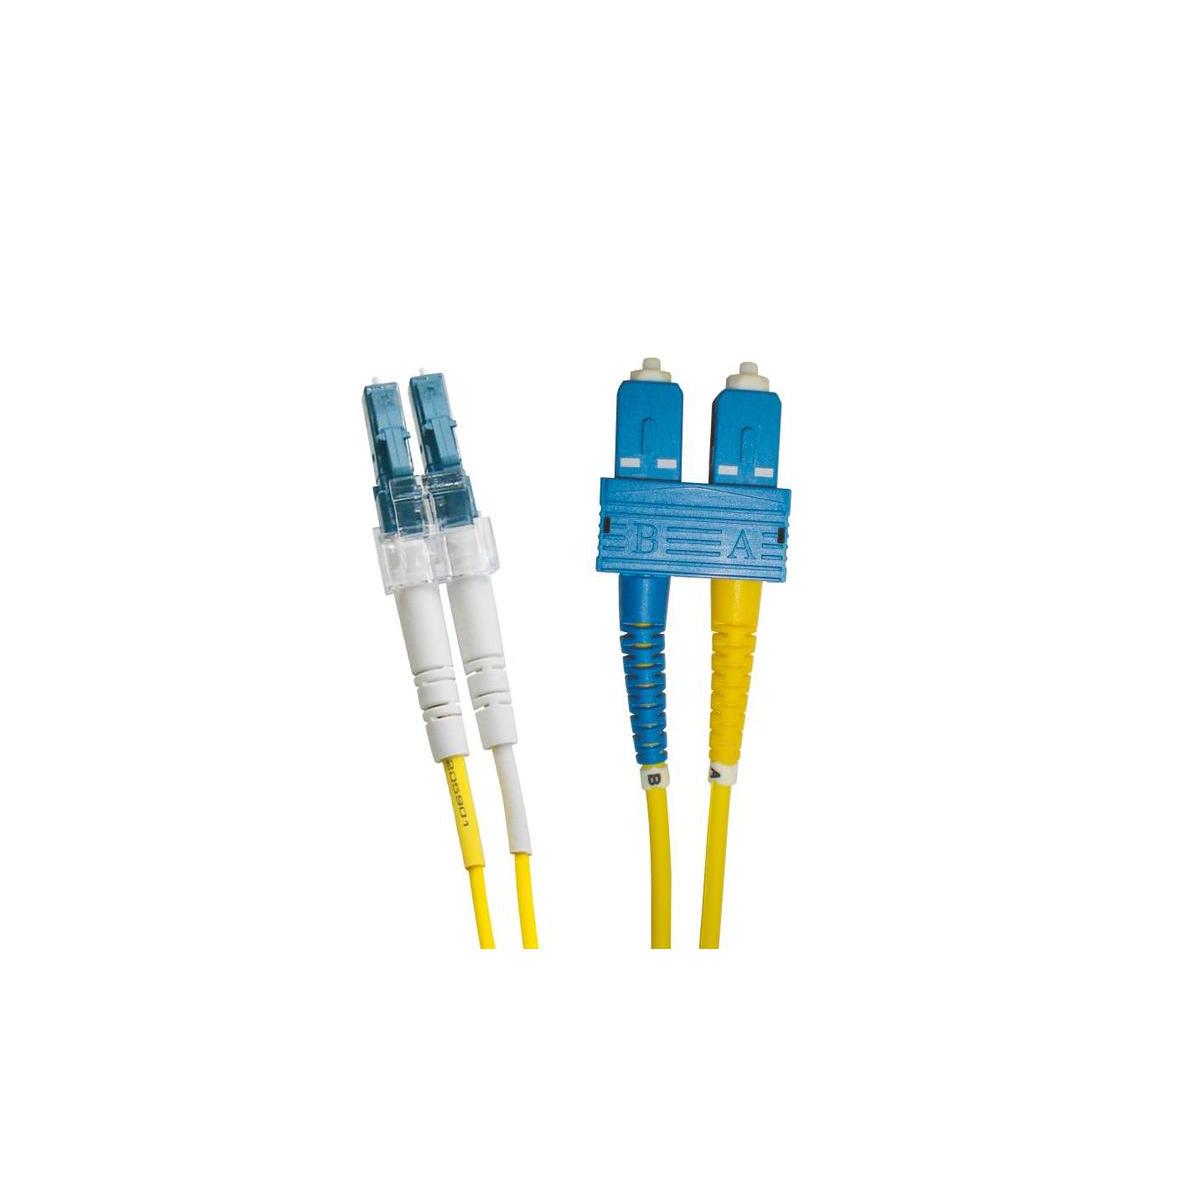 EXCEL OS2 15M LC-SC DUPLEX P/LEAD 9/125